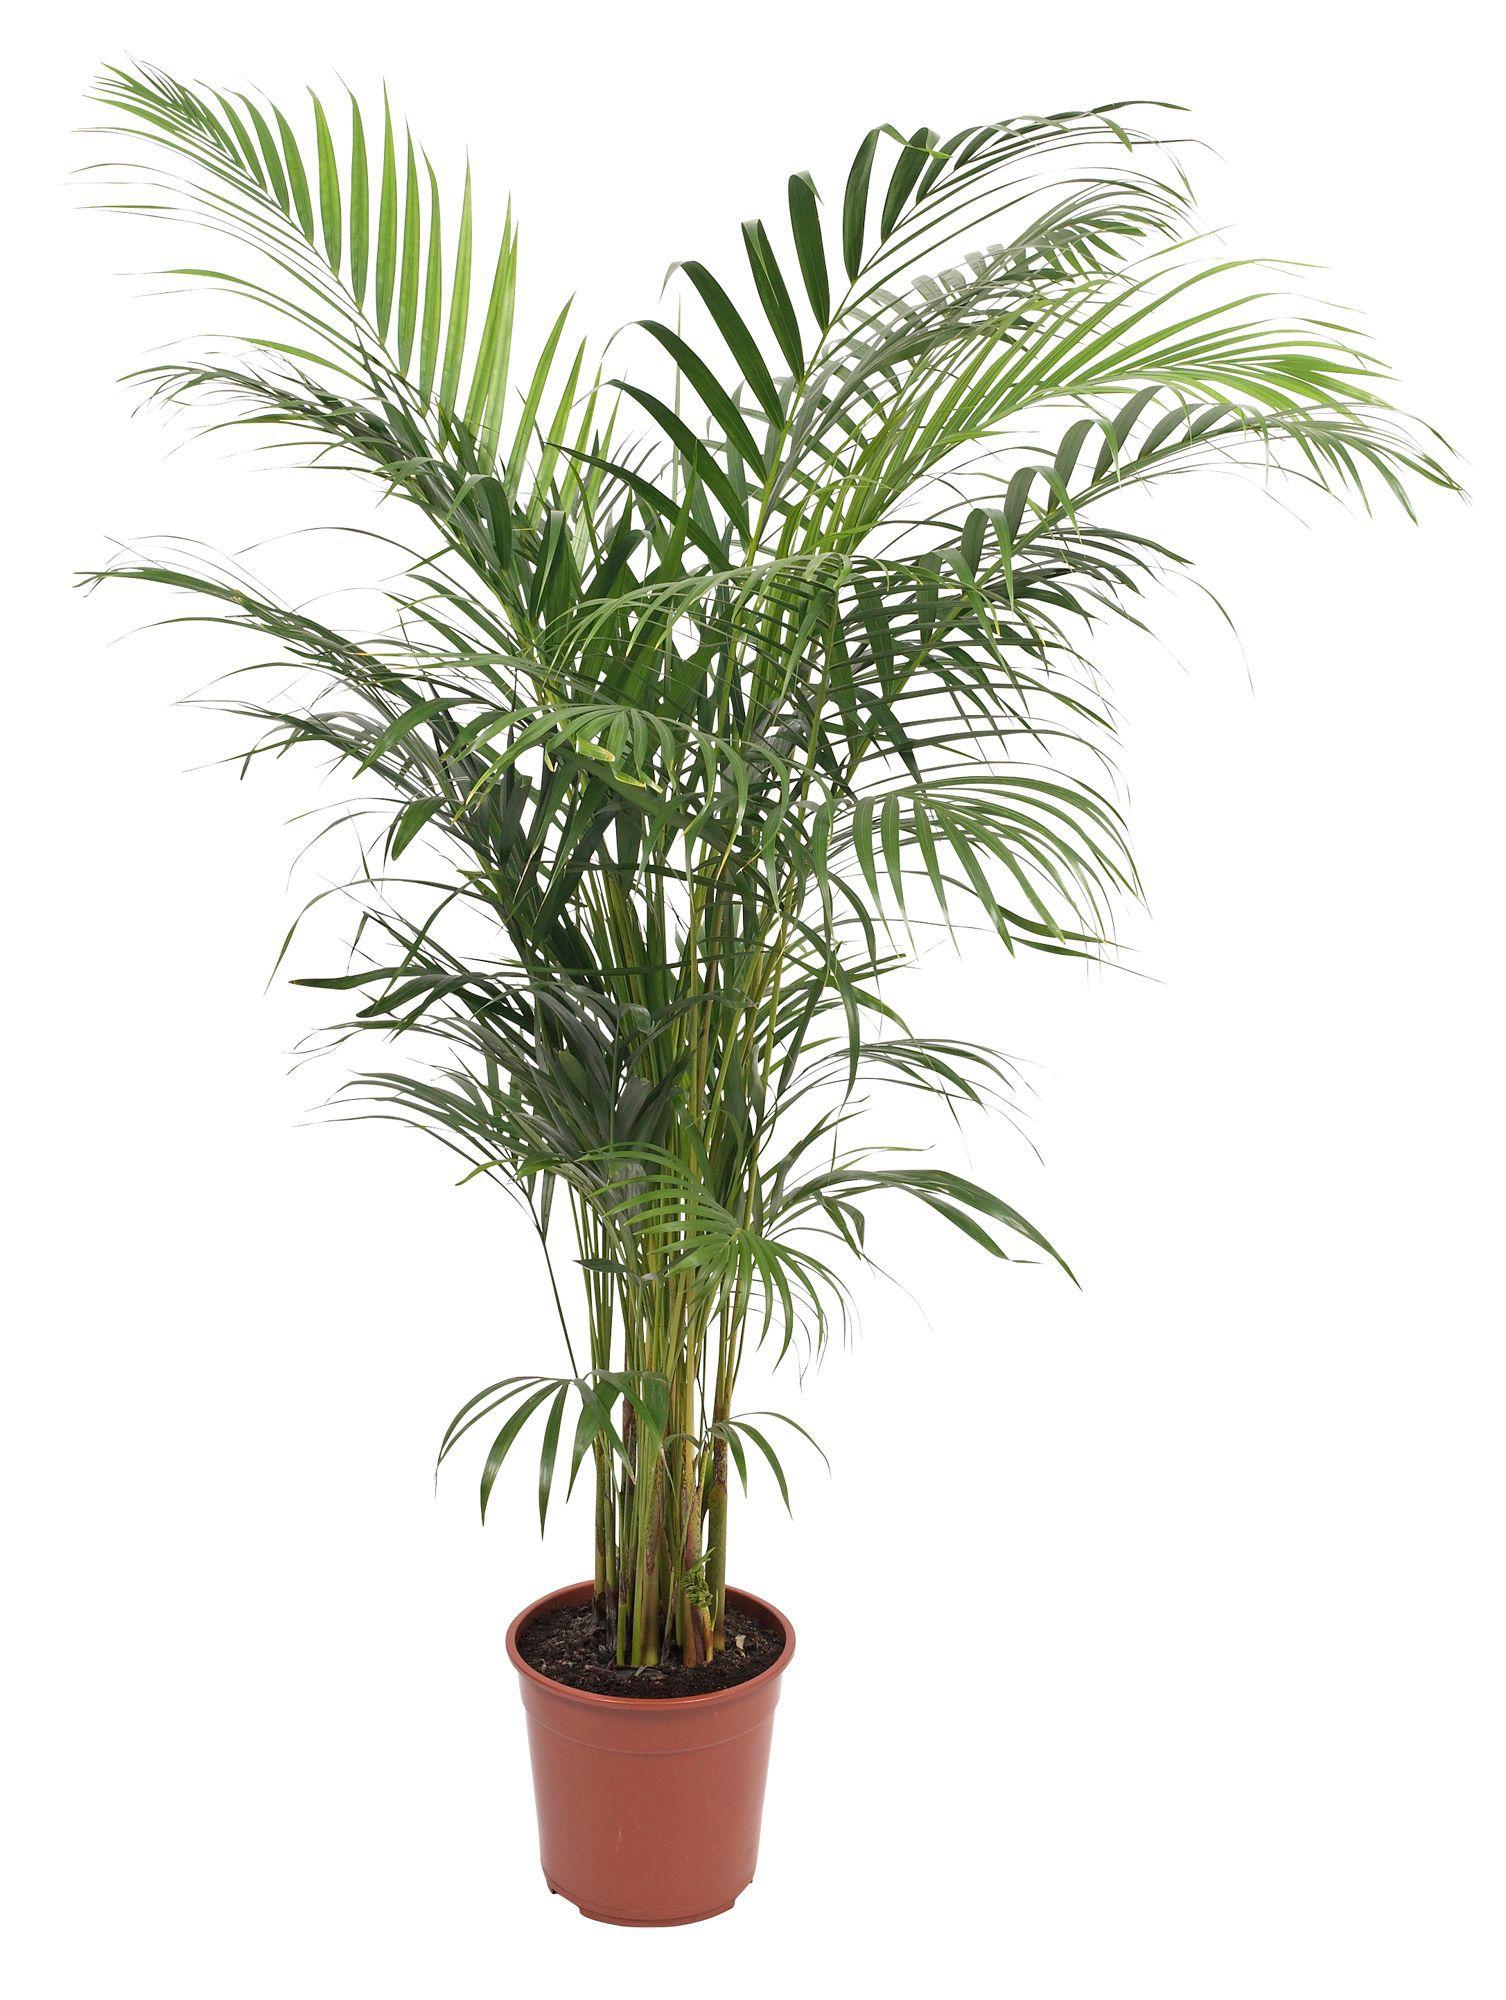 bq palm tree in plant pot departments diy at bq - House Plants Tree